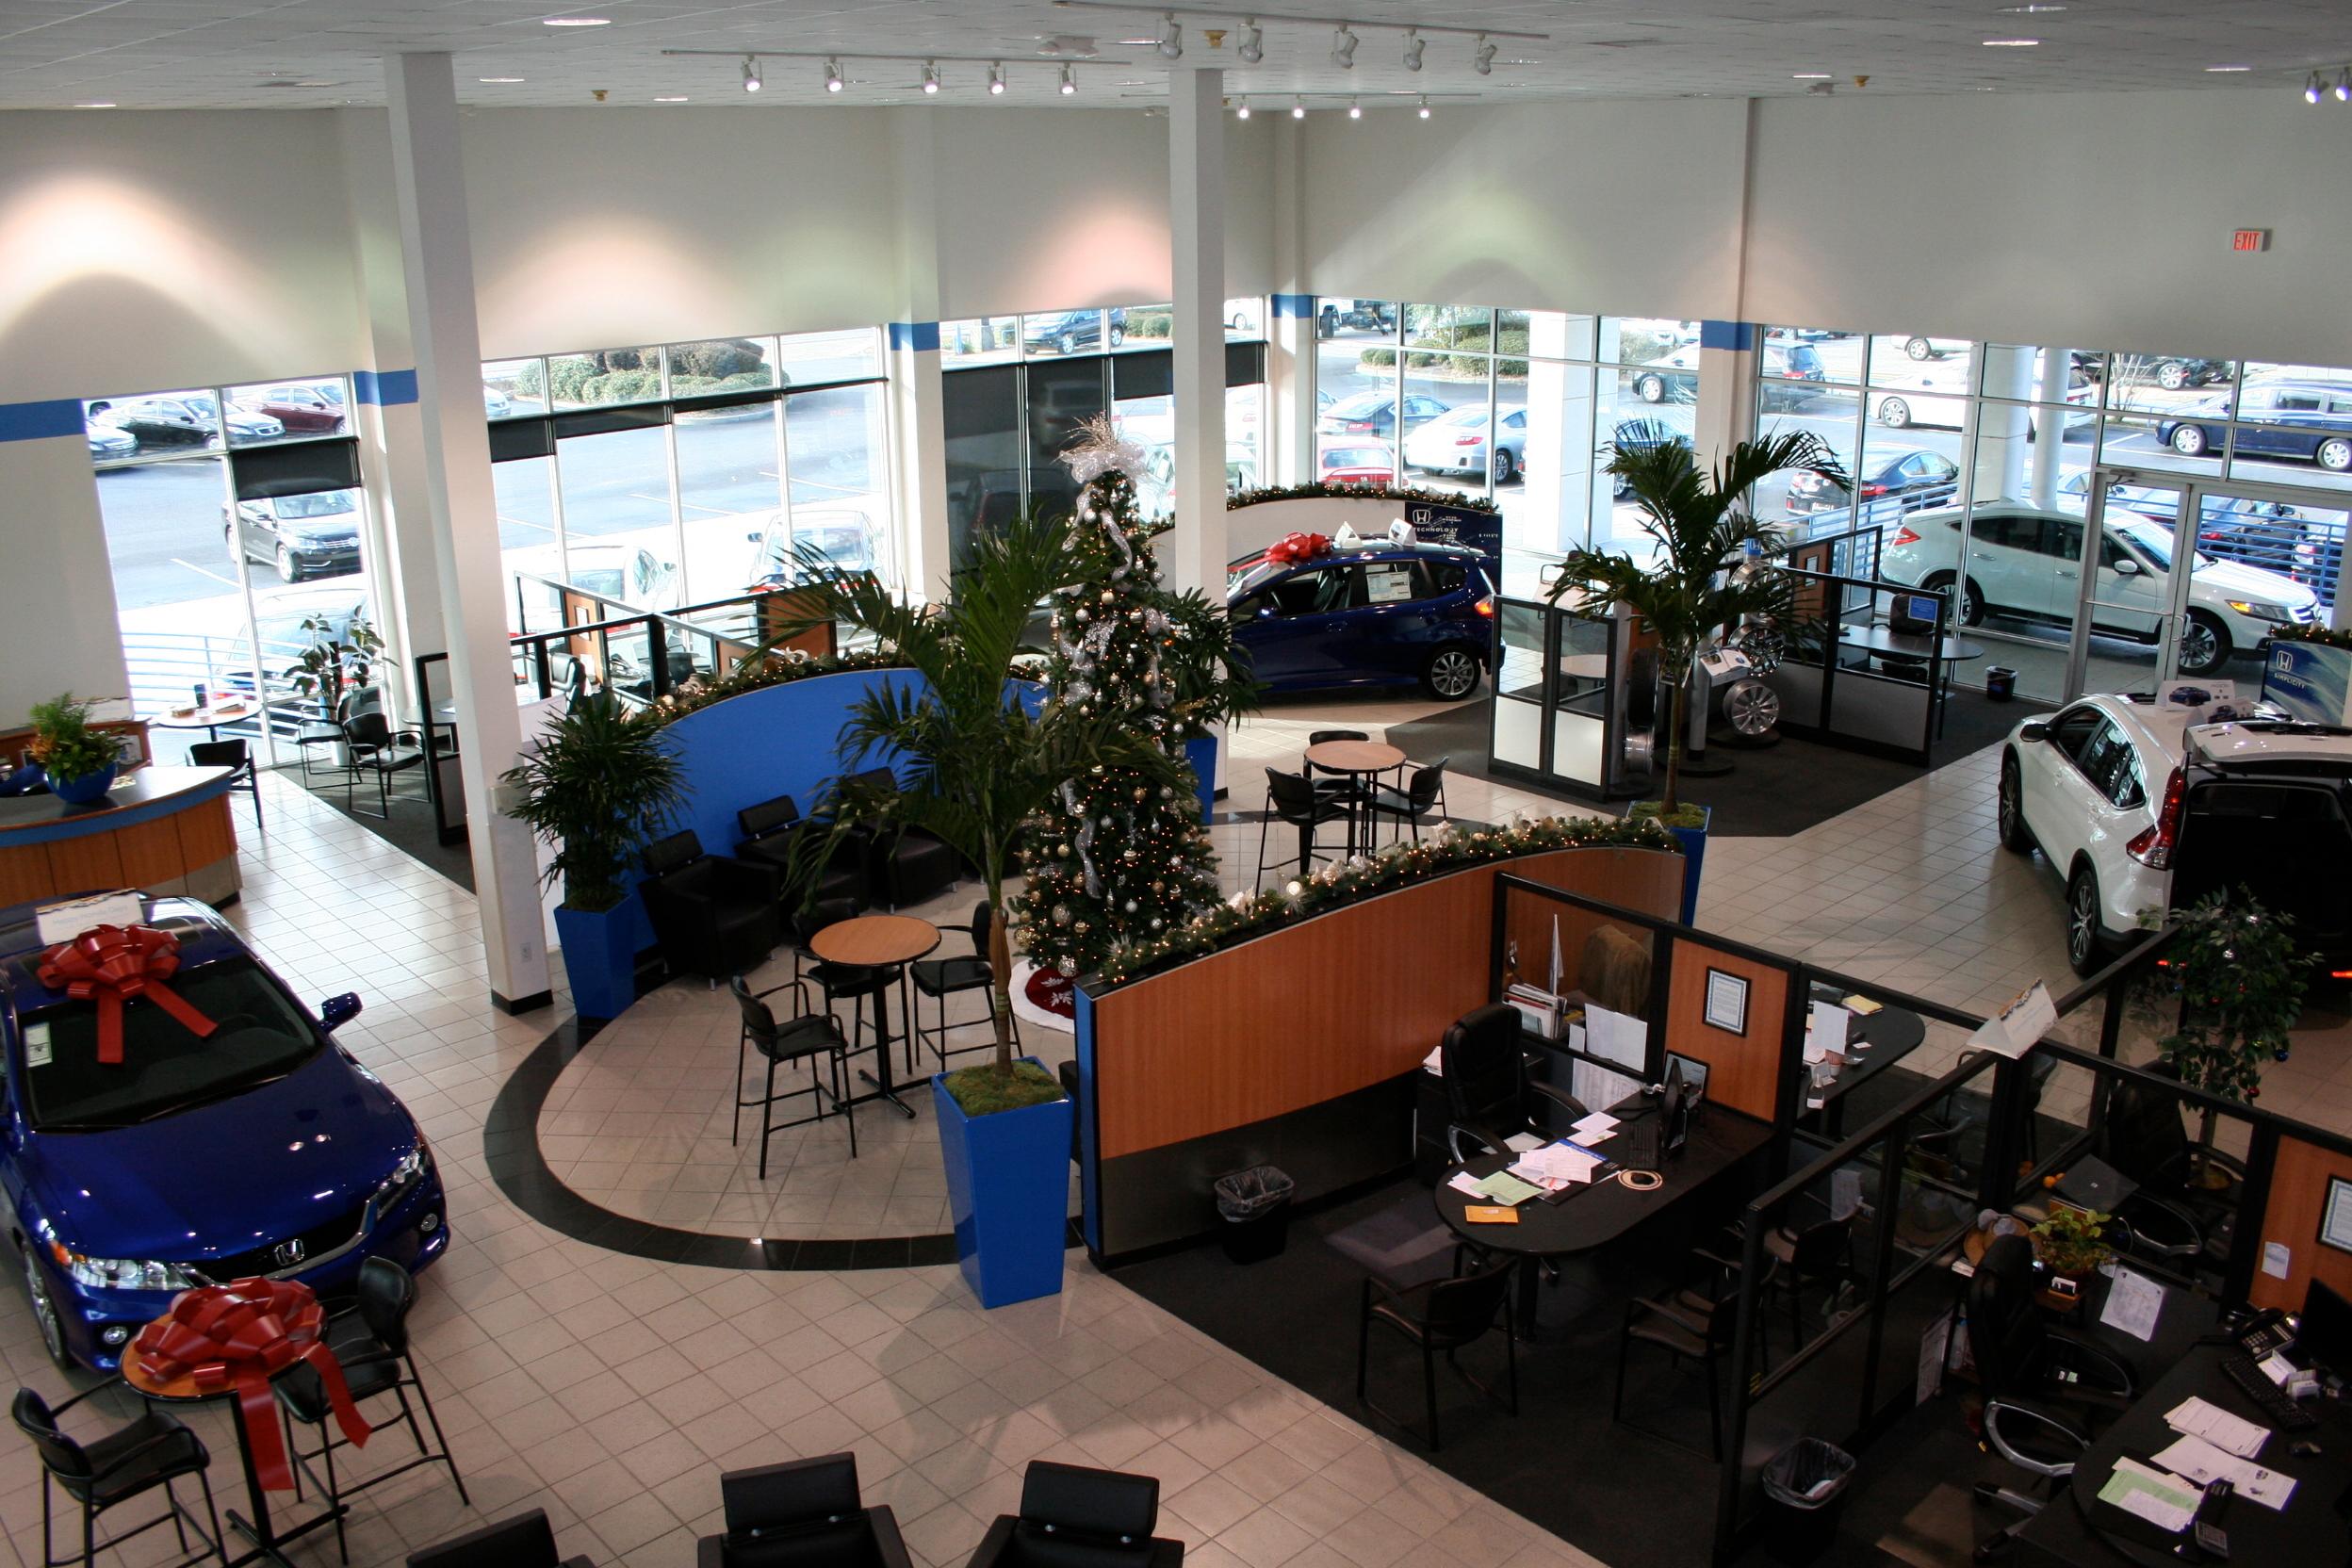 Honda Dealership Mobile Al >> Autonation Honda At Bel Air Mall Car Dealer Mobile Al 36606